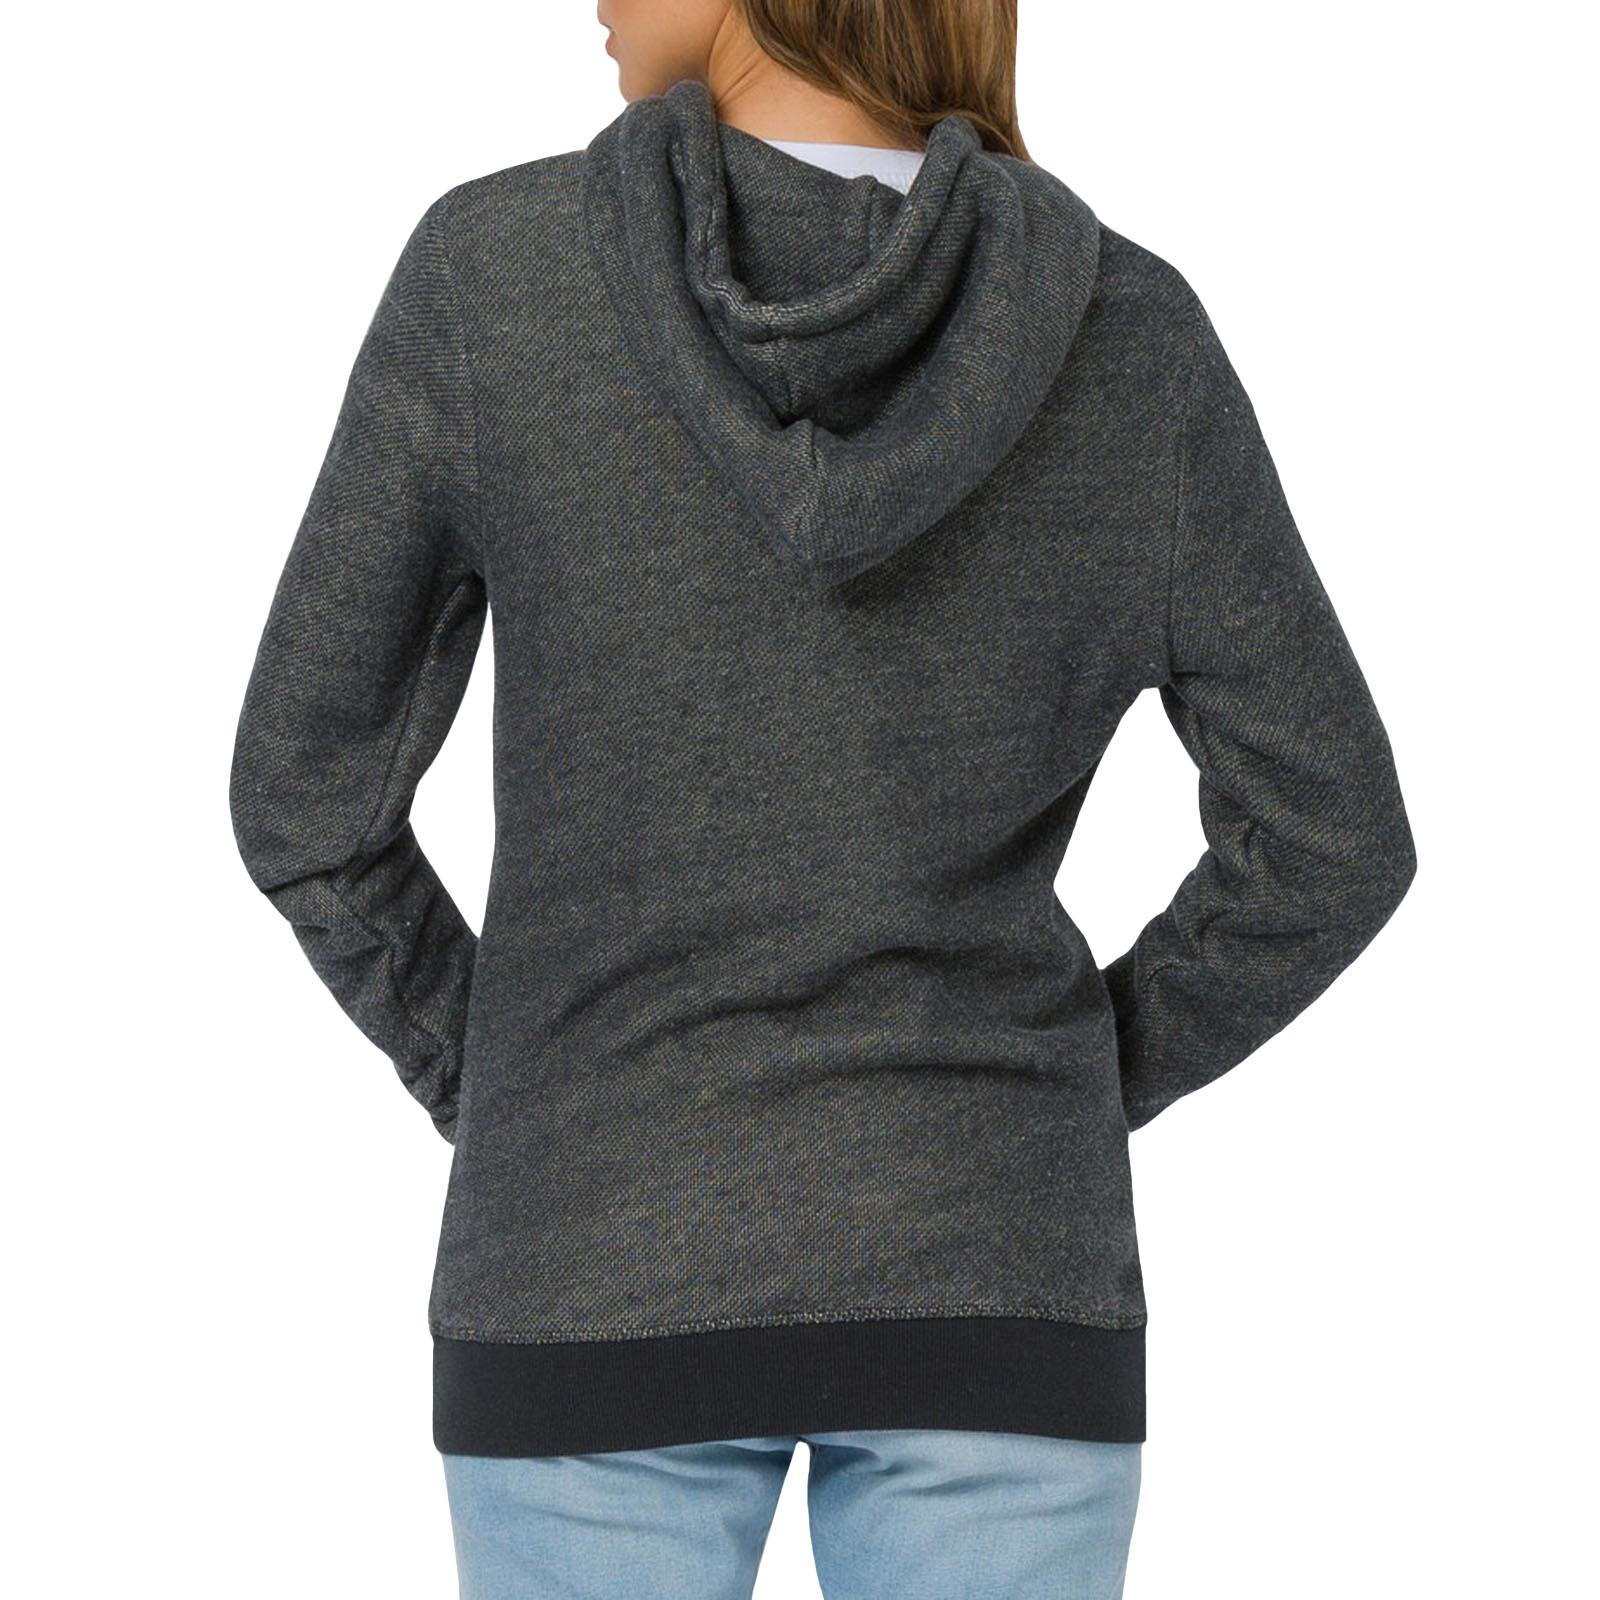 Animal Womens Trailz Casual Long Sleeve Zipped Hooded Sweatshirt Jacket Top